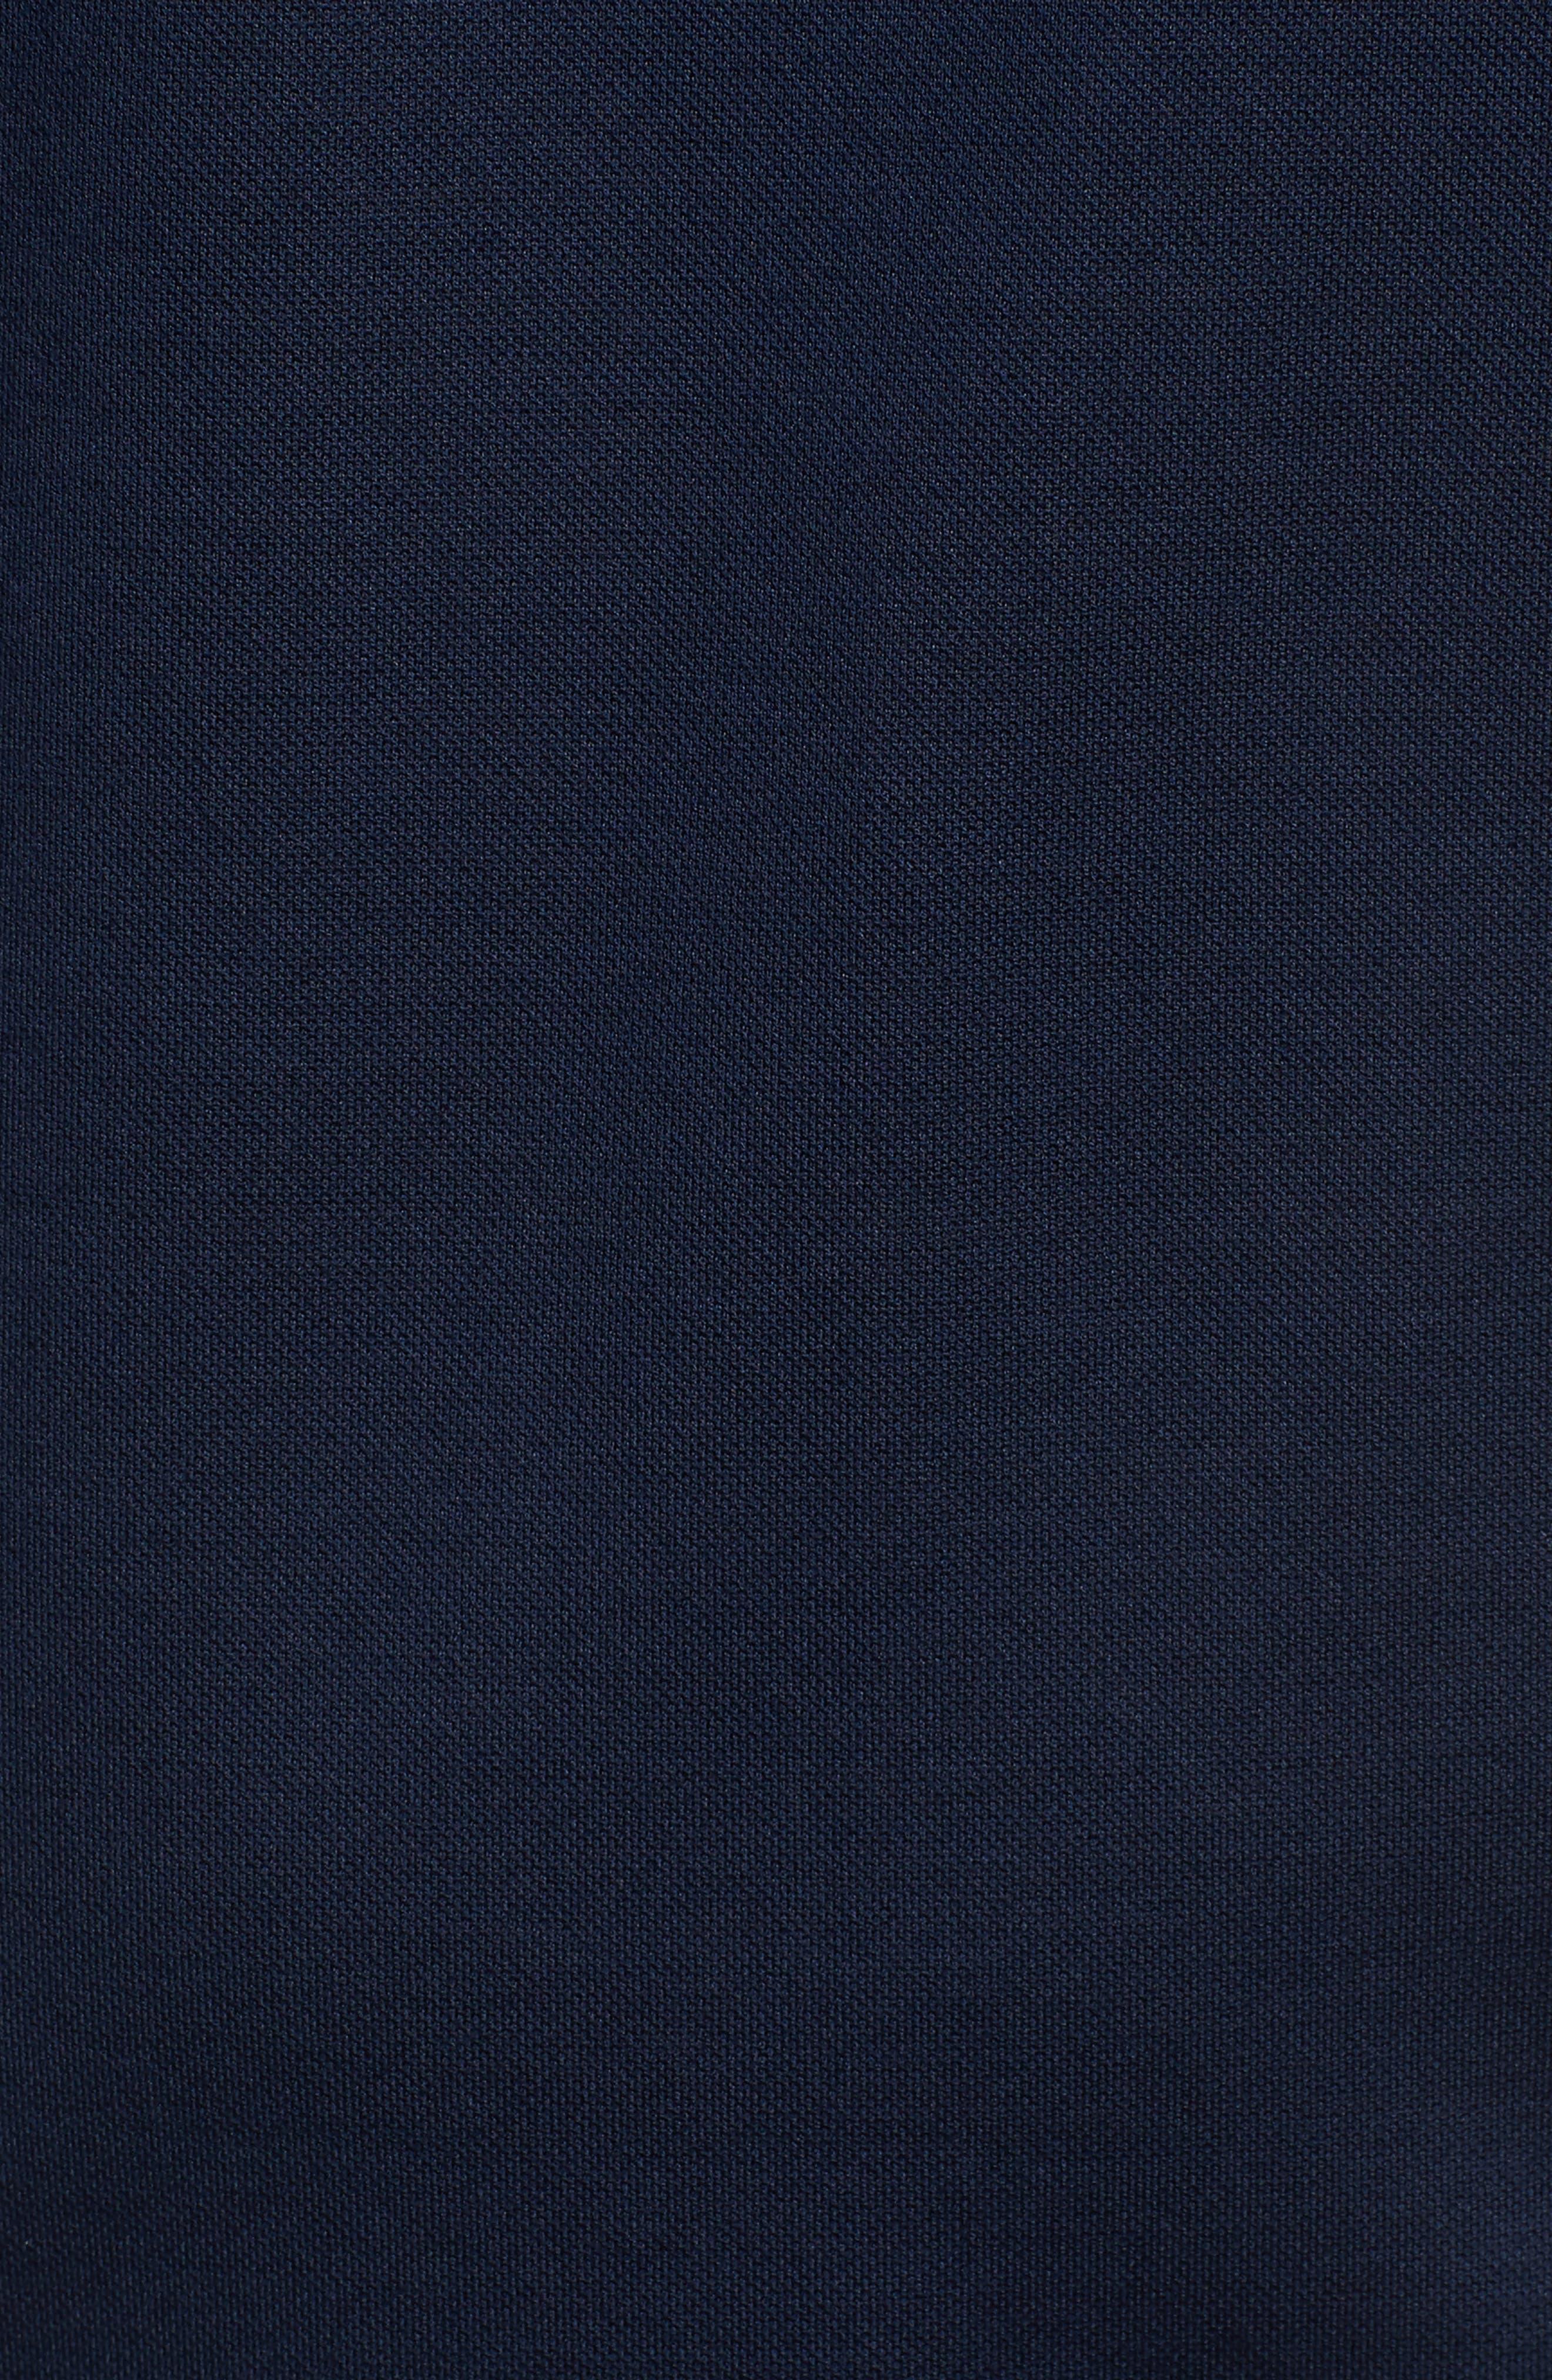 Paul&Shark Stripe Trim Piqué Polo,                             Alternate thumbnail 5, color,                             Navy